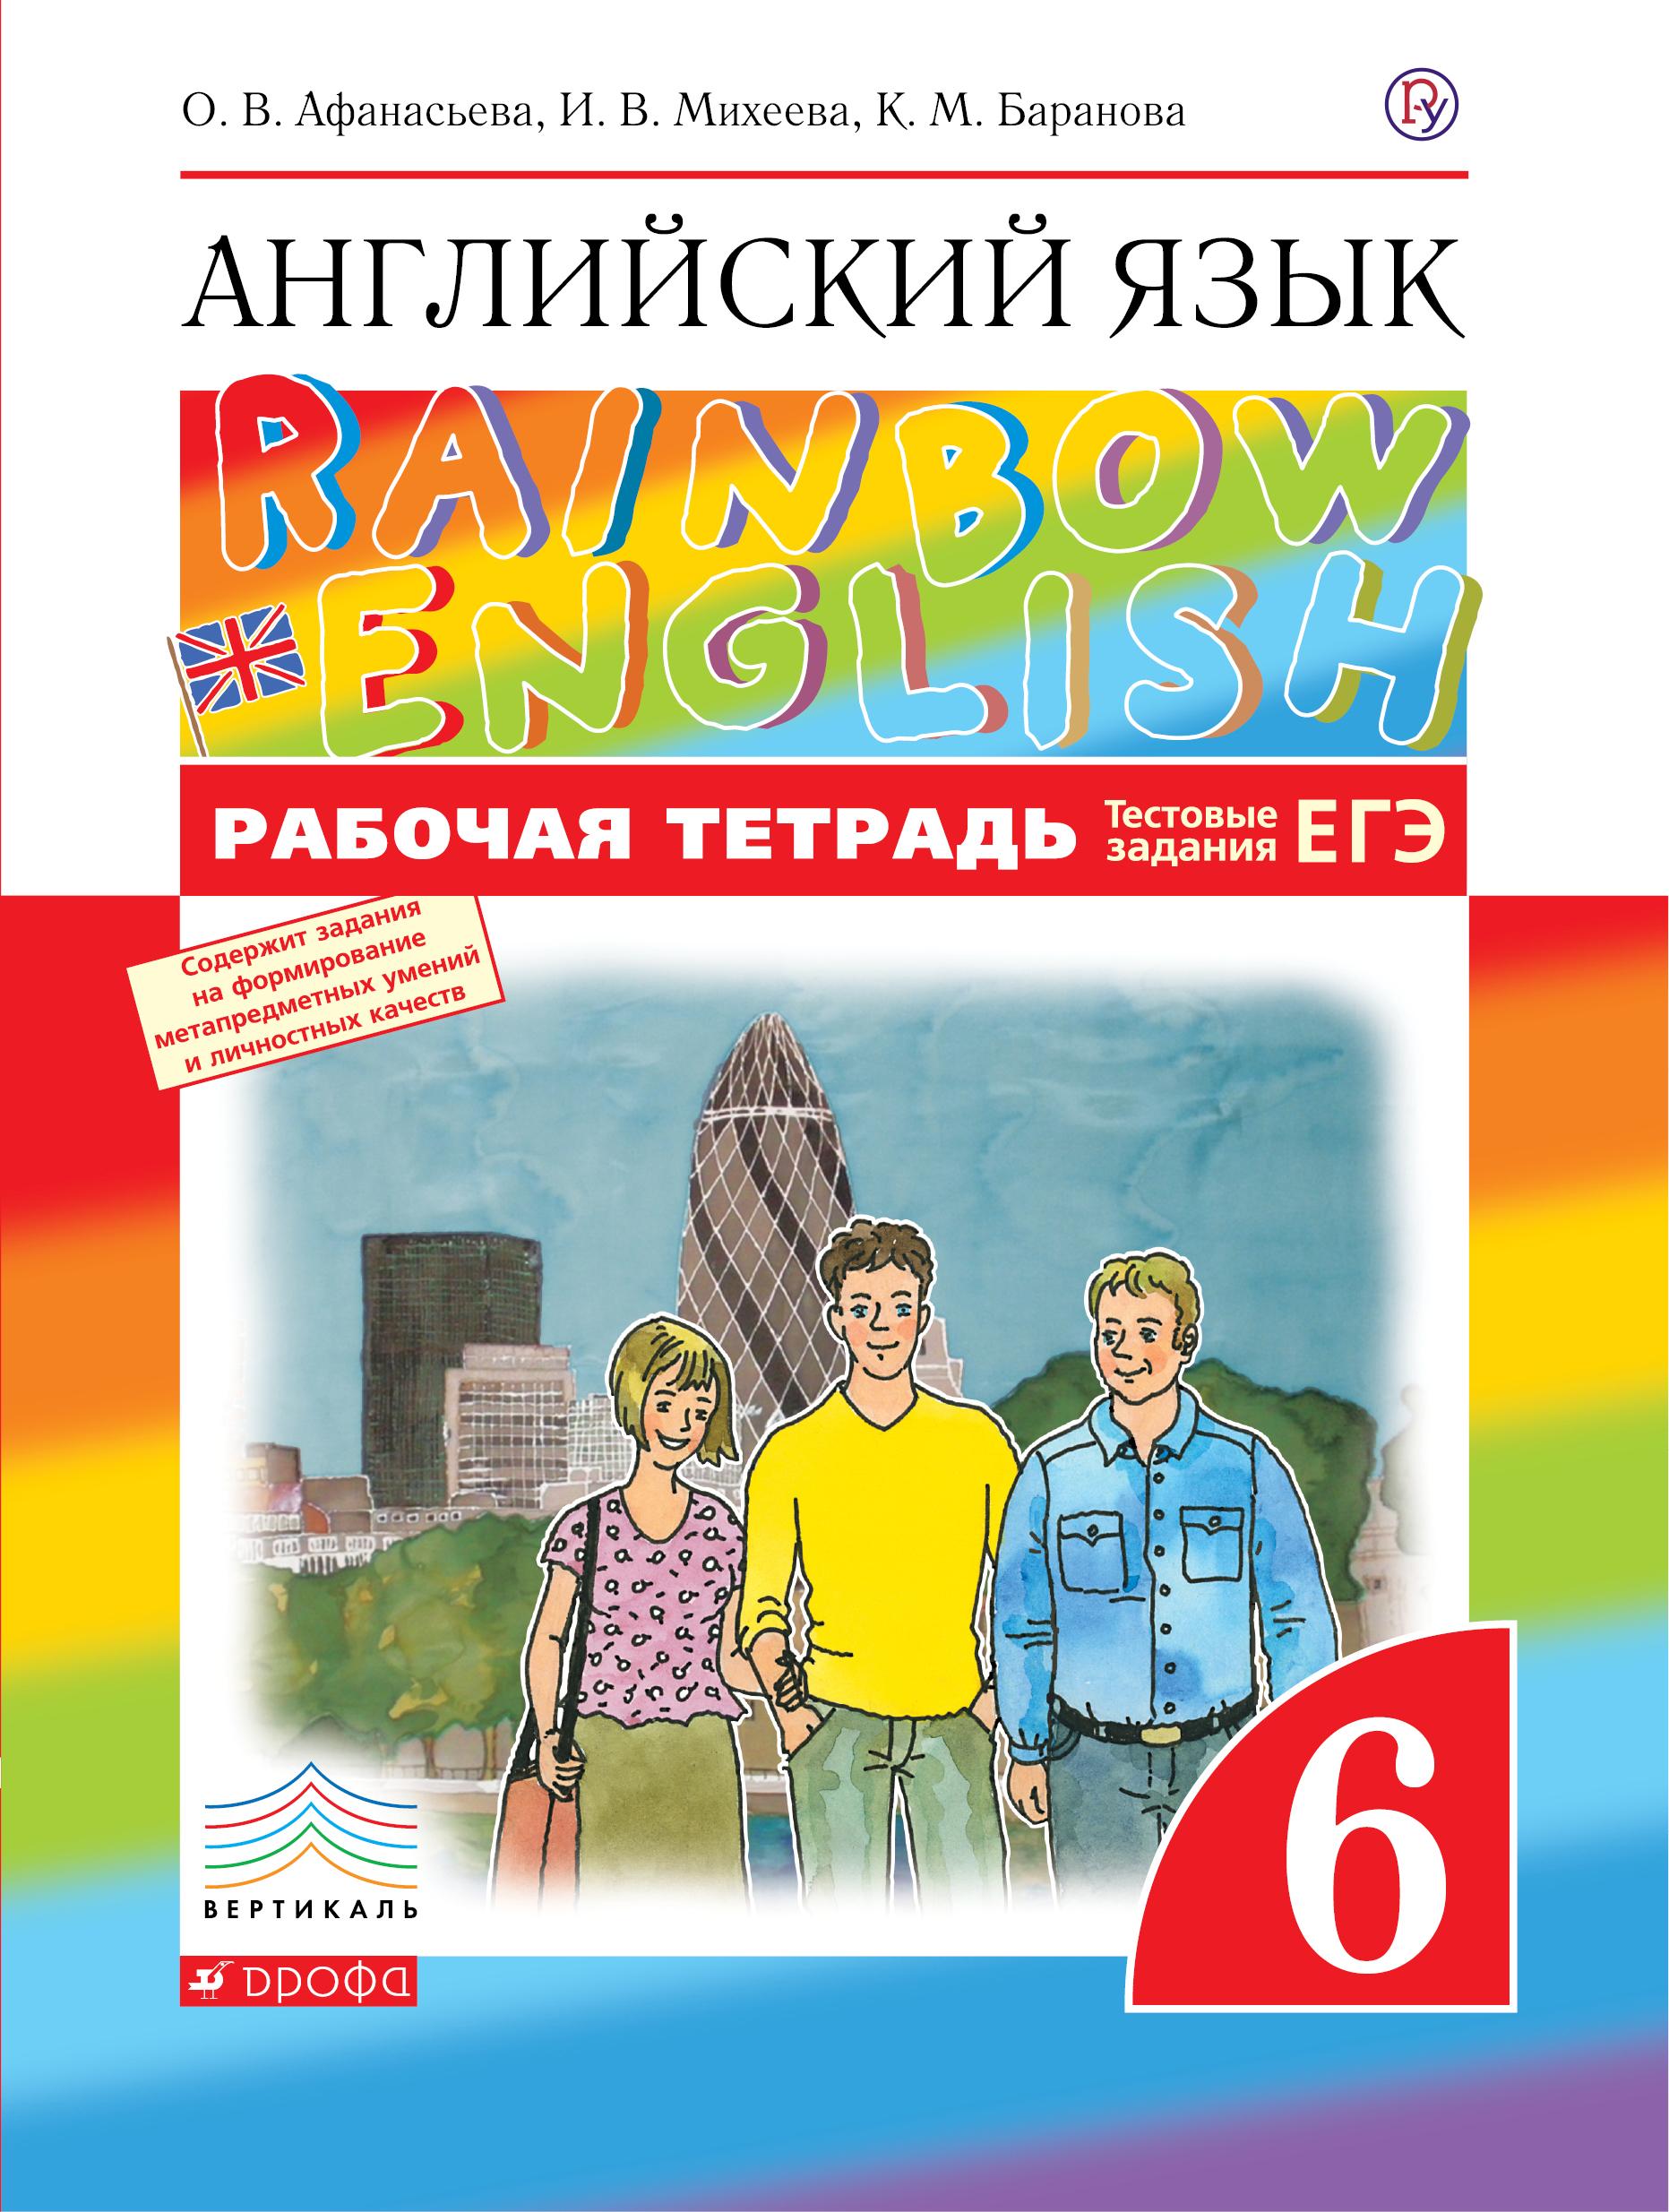 Гдз По Английскому 6 Класс Афанасьев Михеев